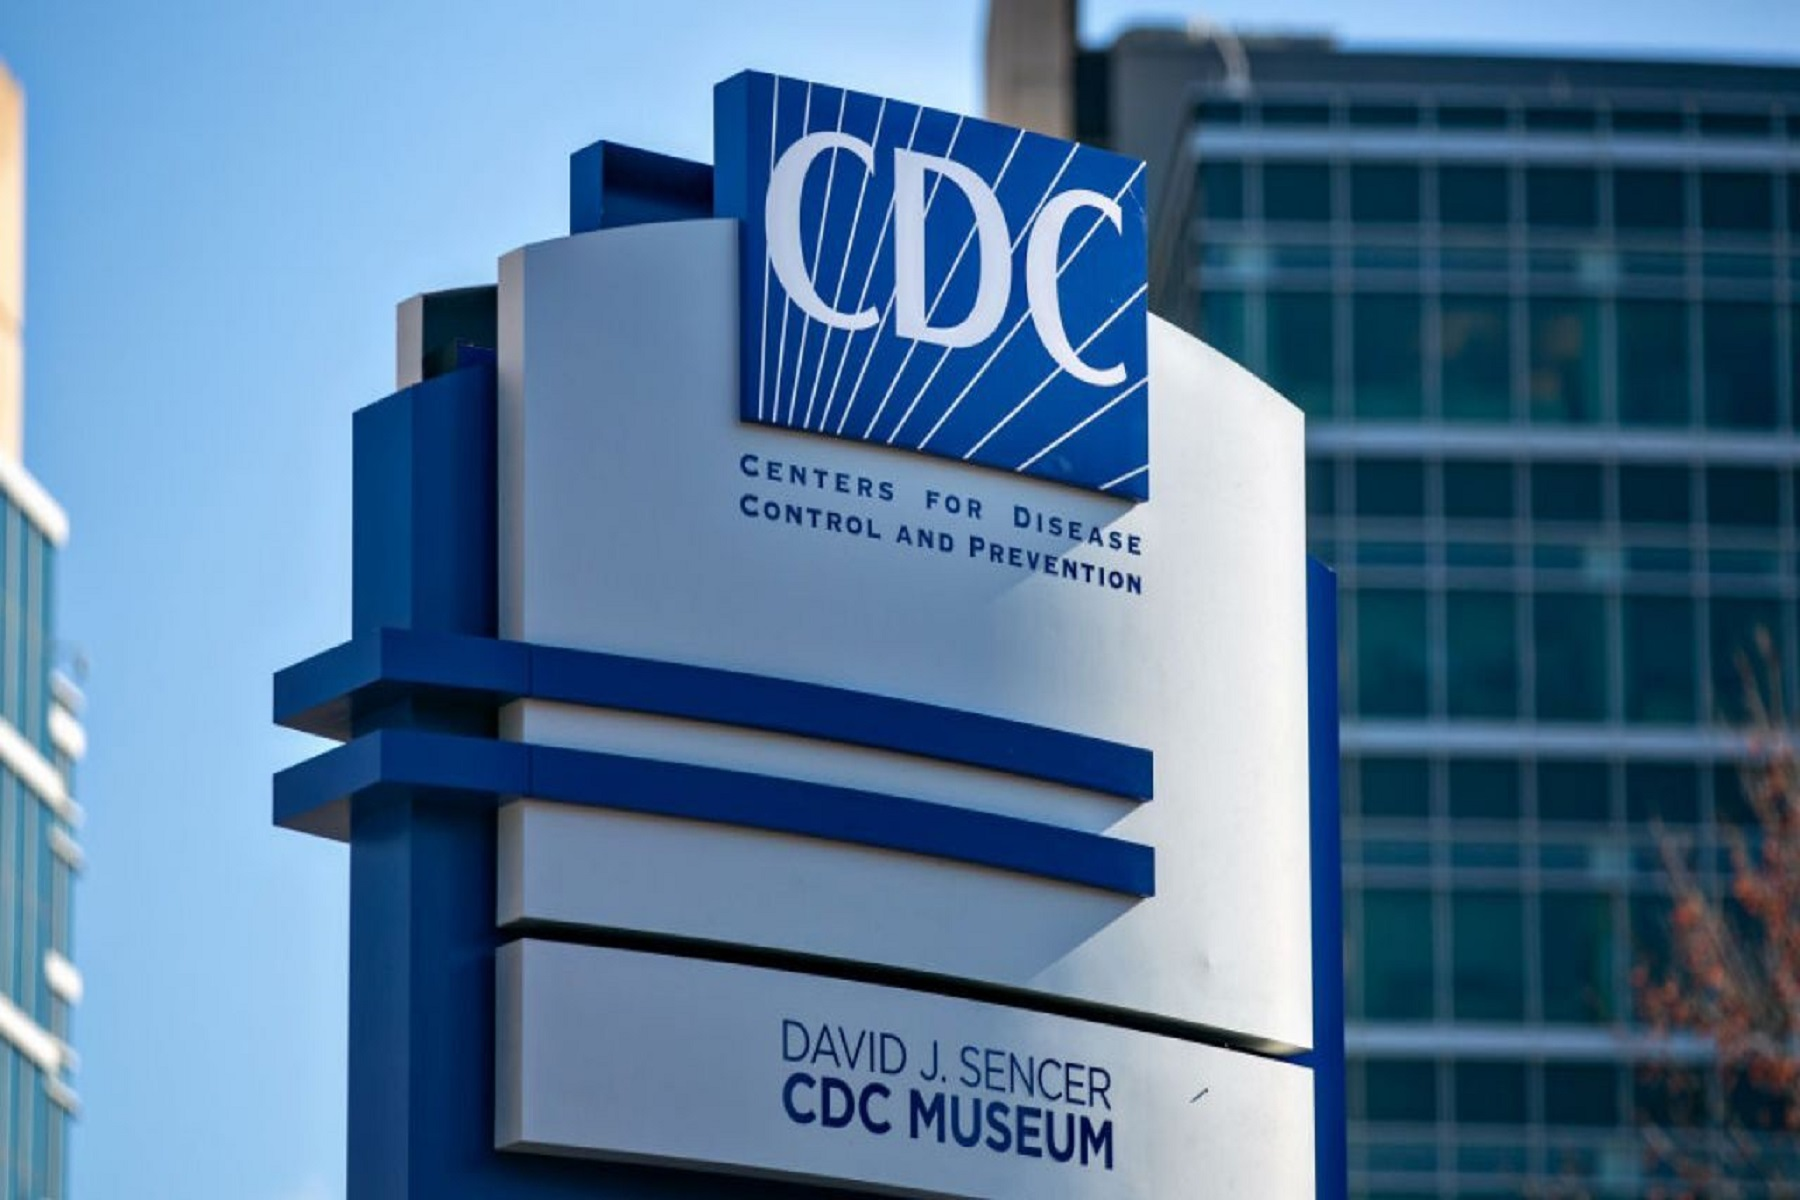 CDC Walensky ΗΠΑ: Εξελισσόμενα δεδομένα για τον κορωνοϊό αλλάζουν την πολιτική της μάσκας